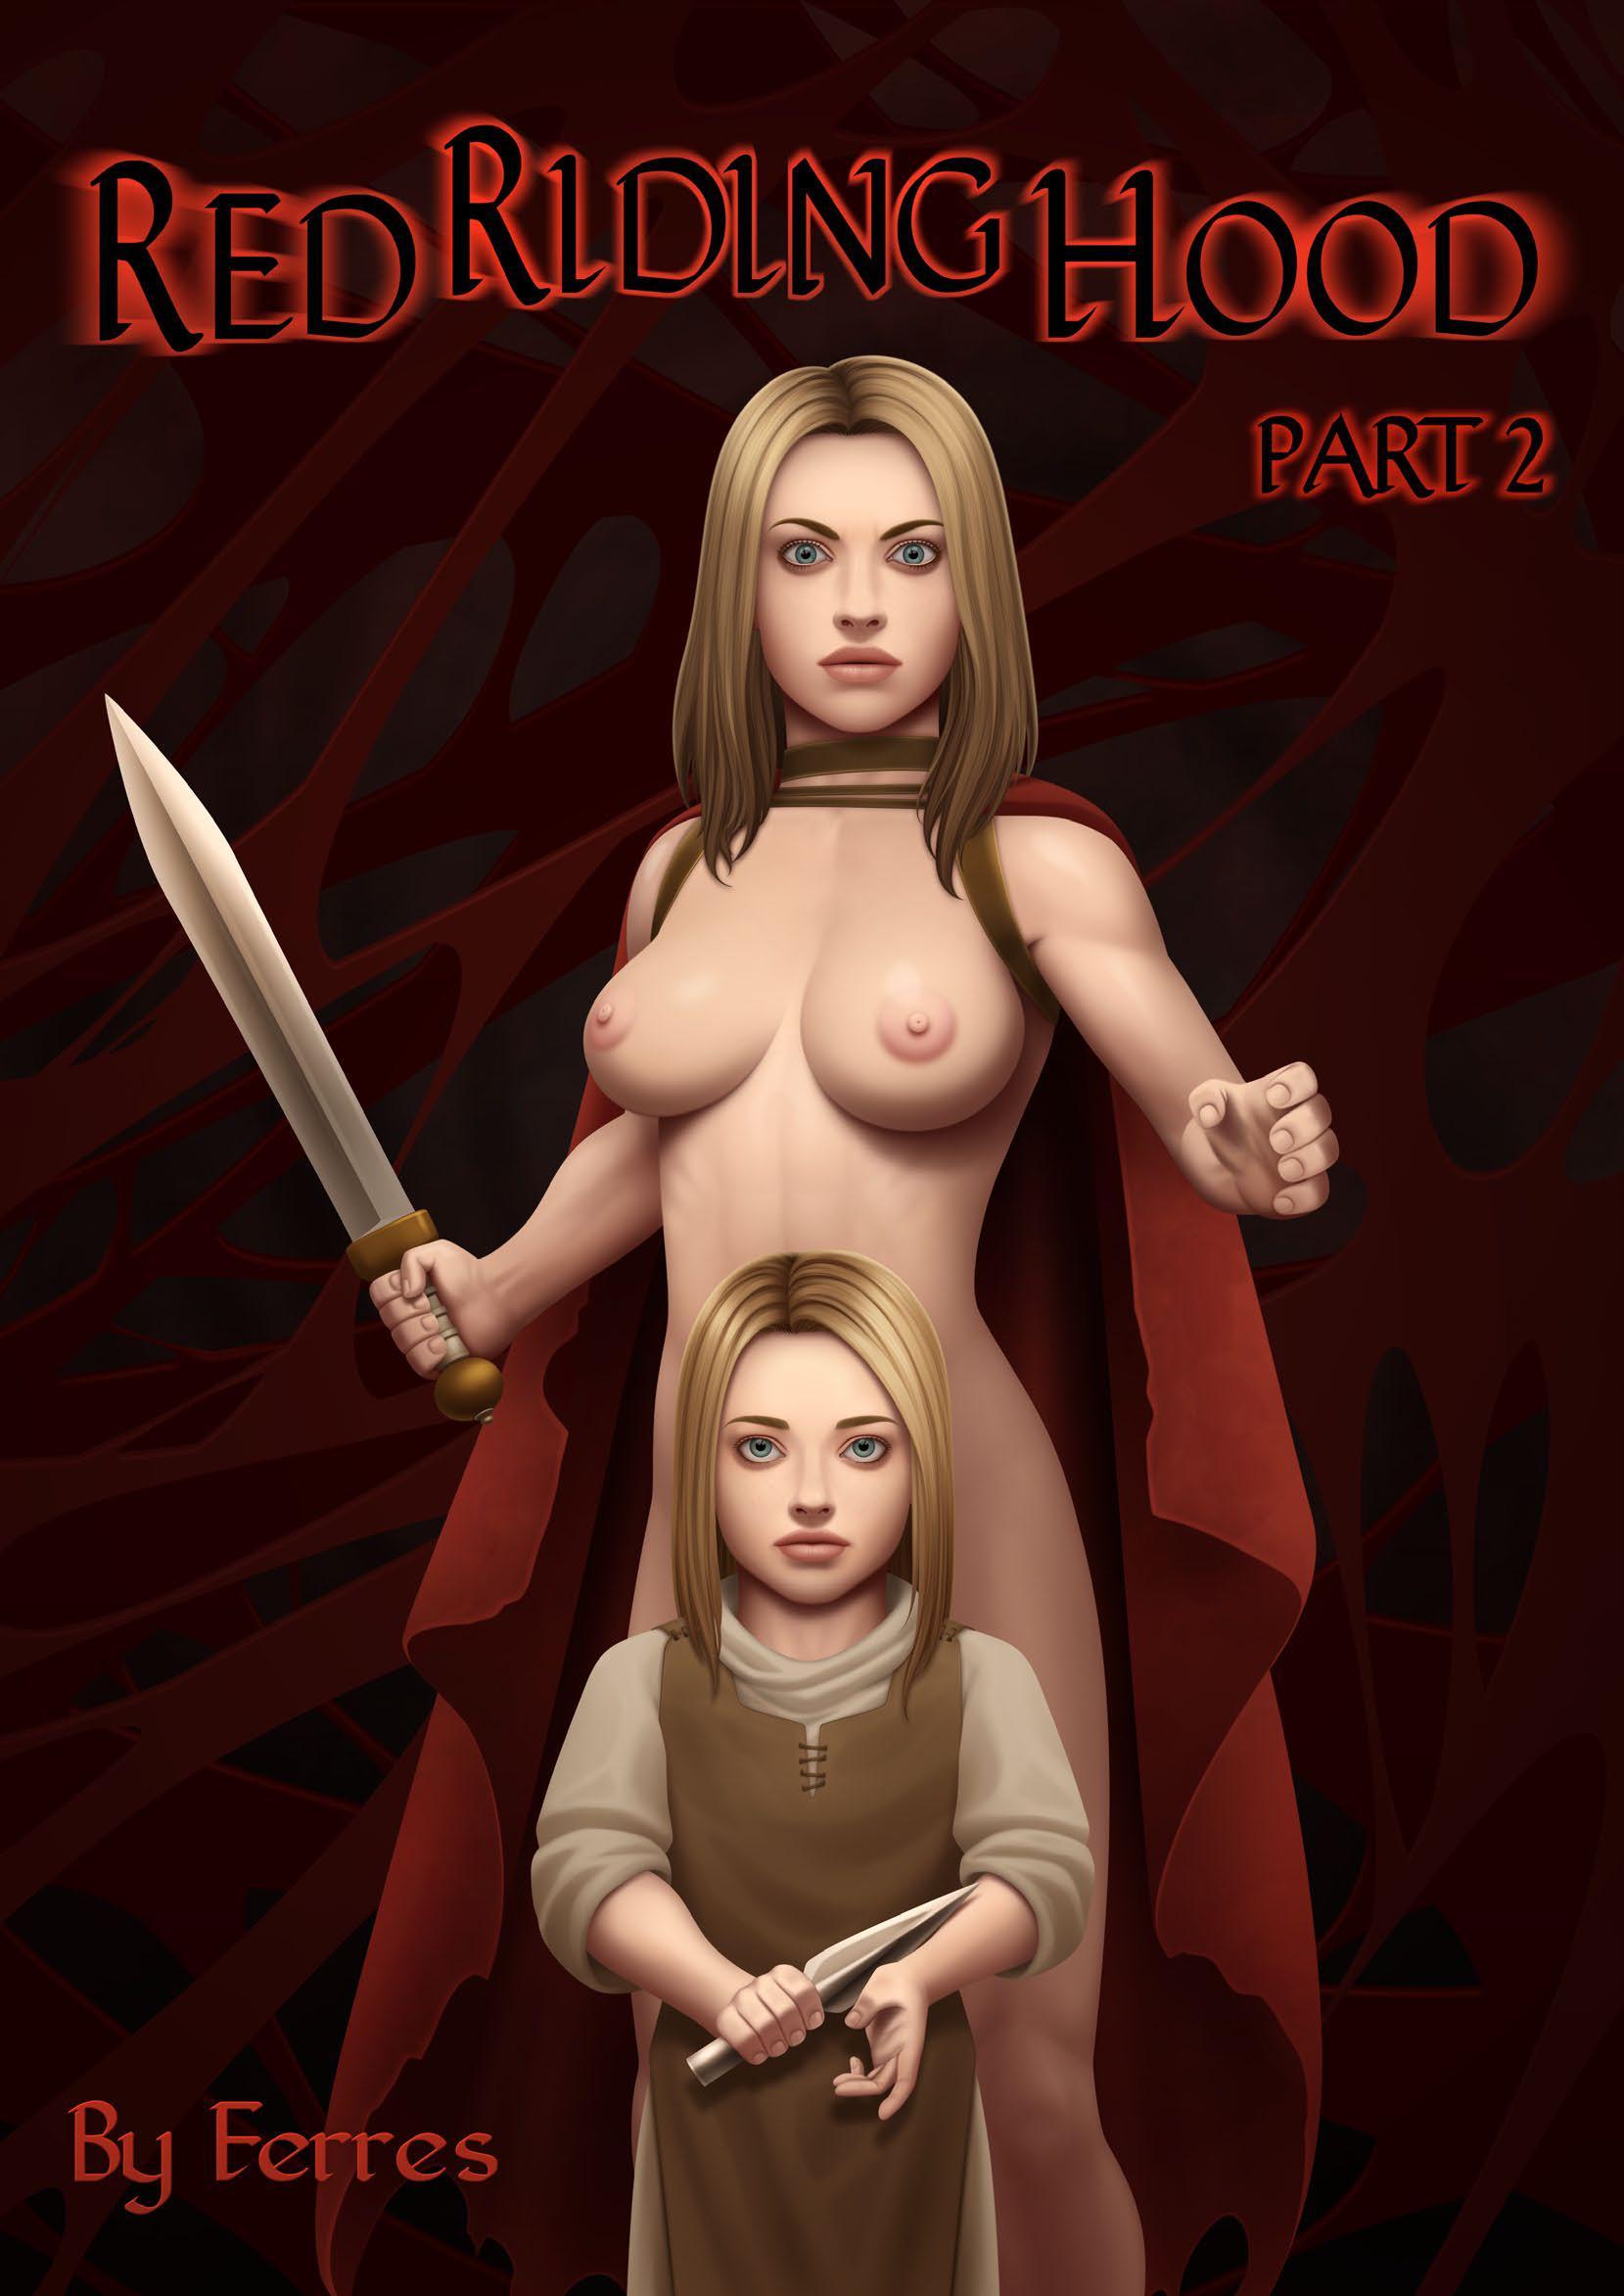 SureFap xxx porno Little Red Riding Hood - [Fansadox Collection][Ferres](357) - Red #2 (Wordless)